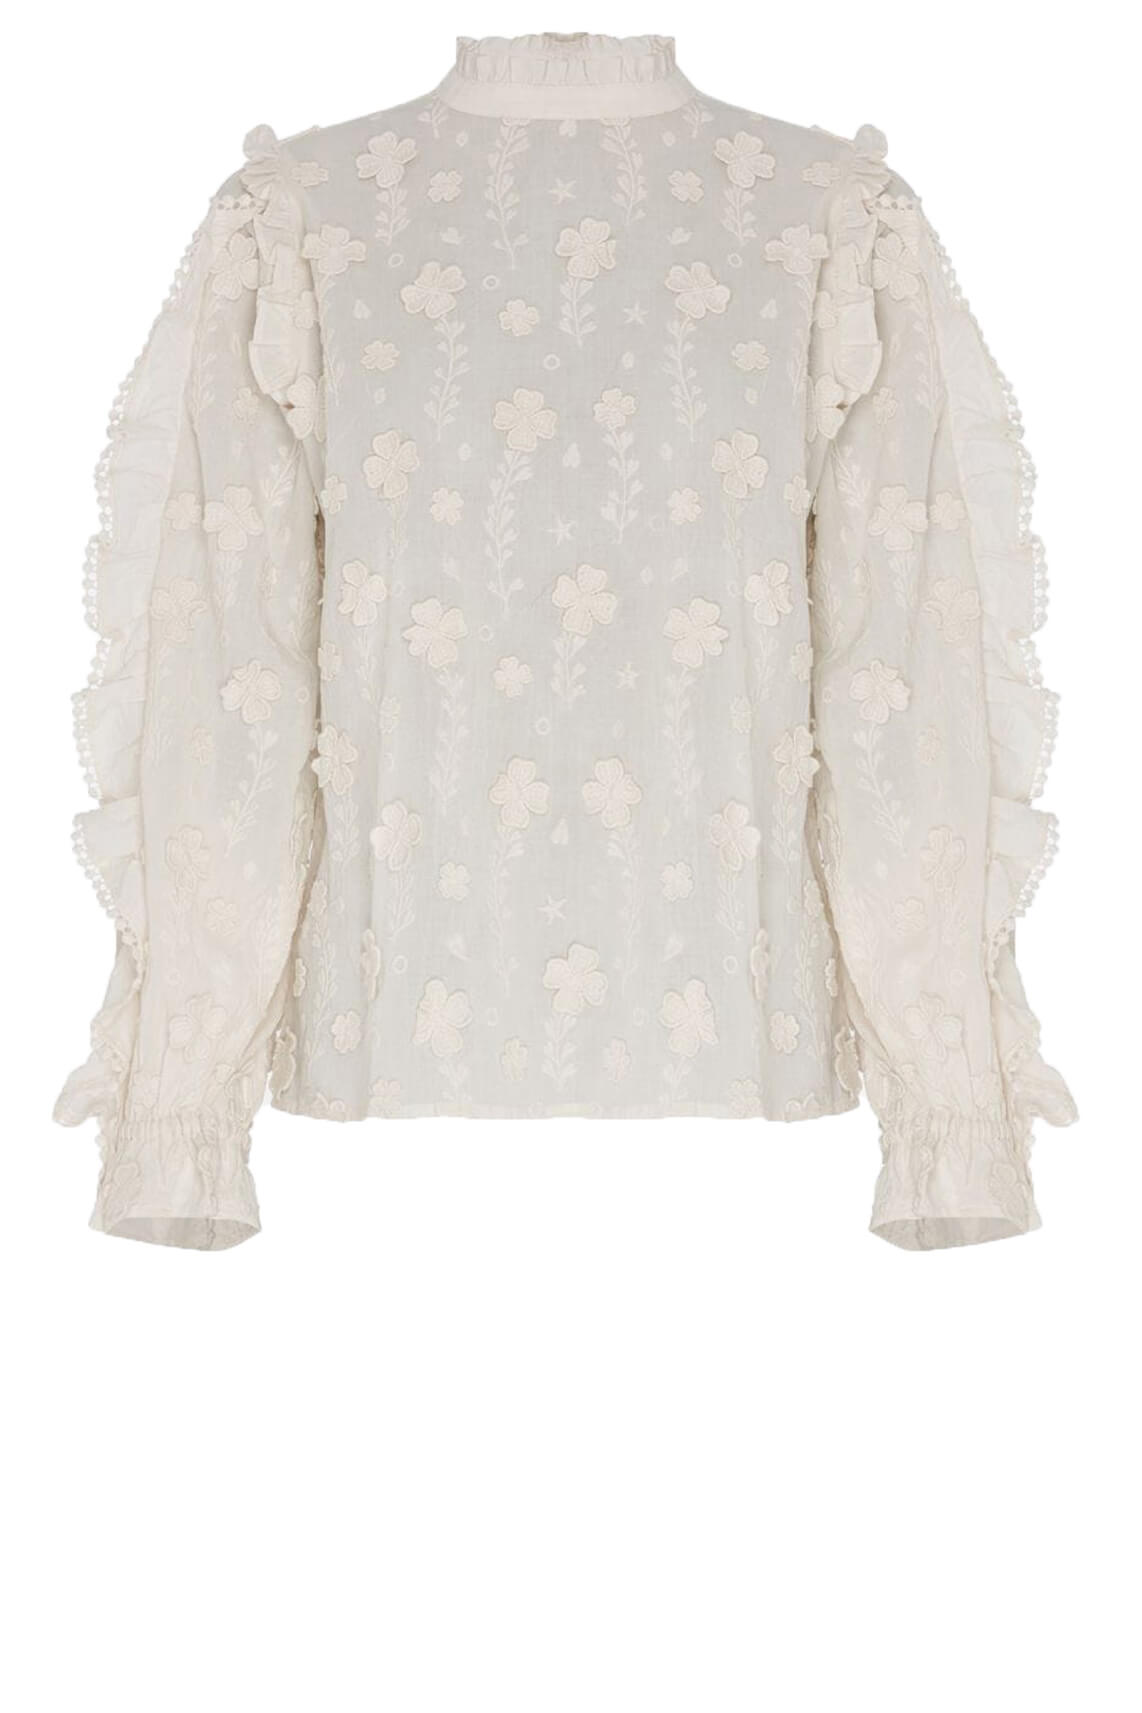 Fabienne Chapot Dames Josefin blouse Wit